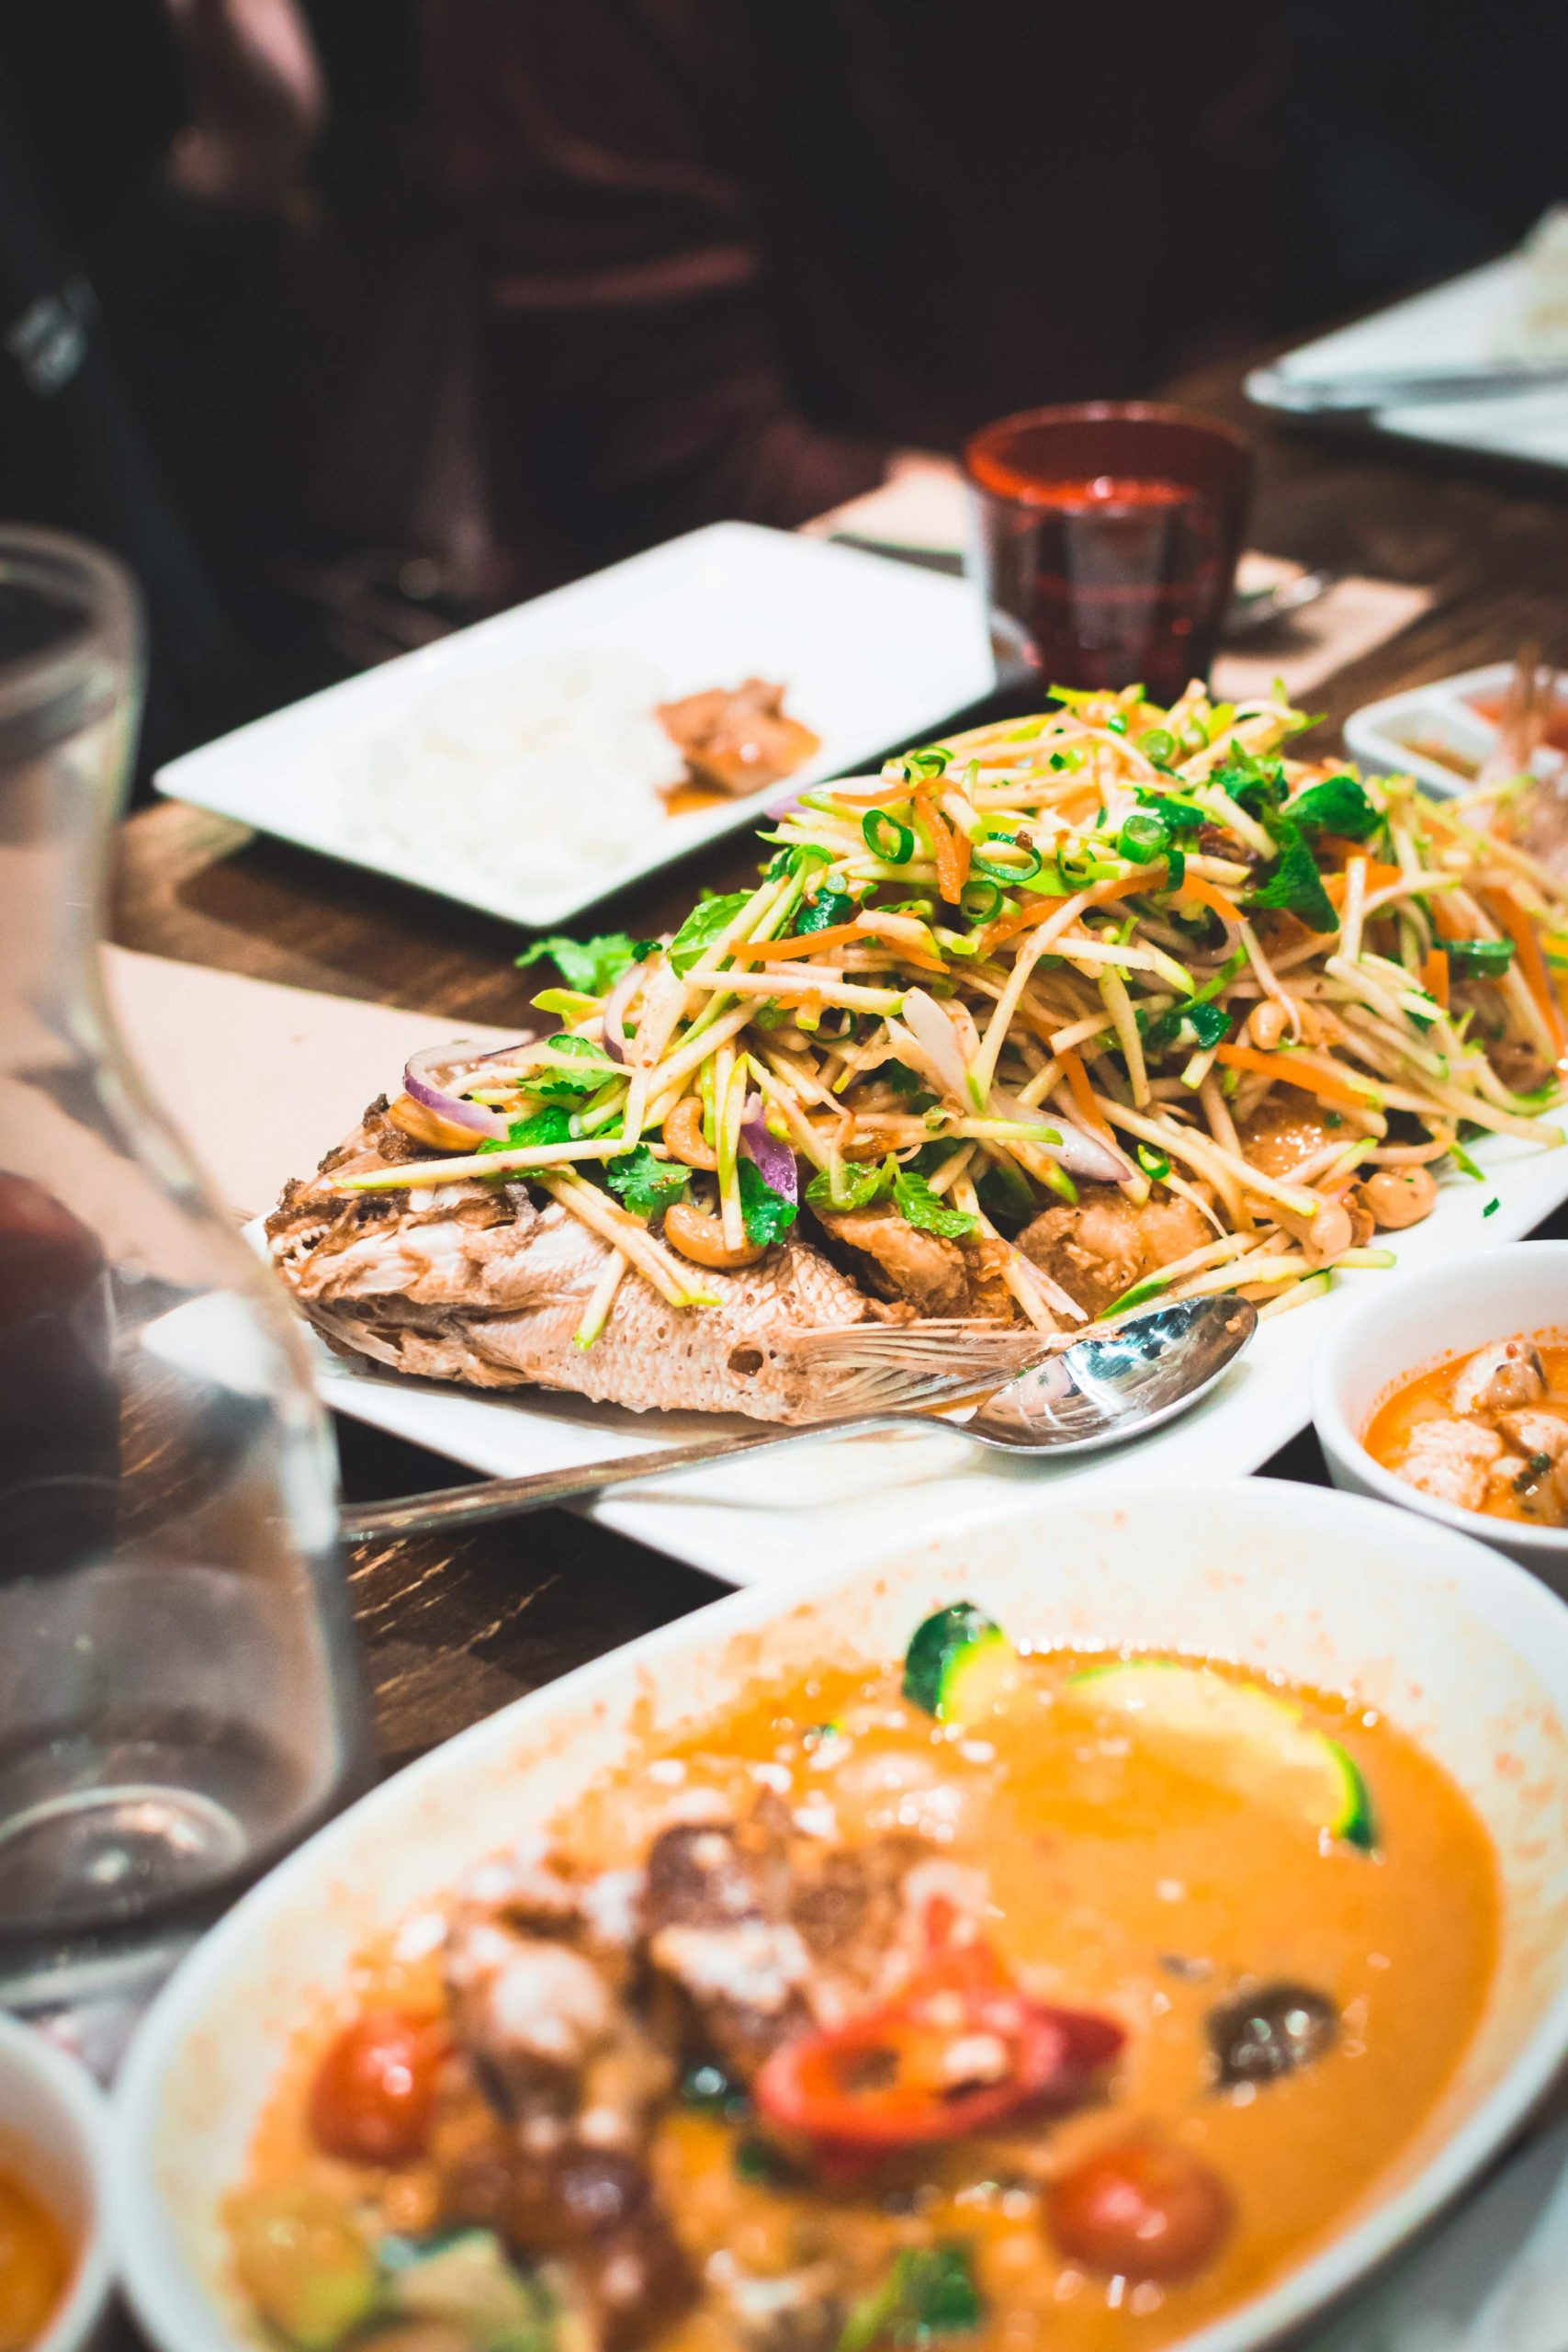 05. Culinary travel